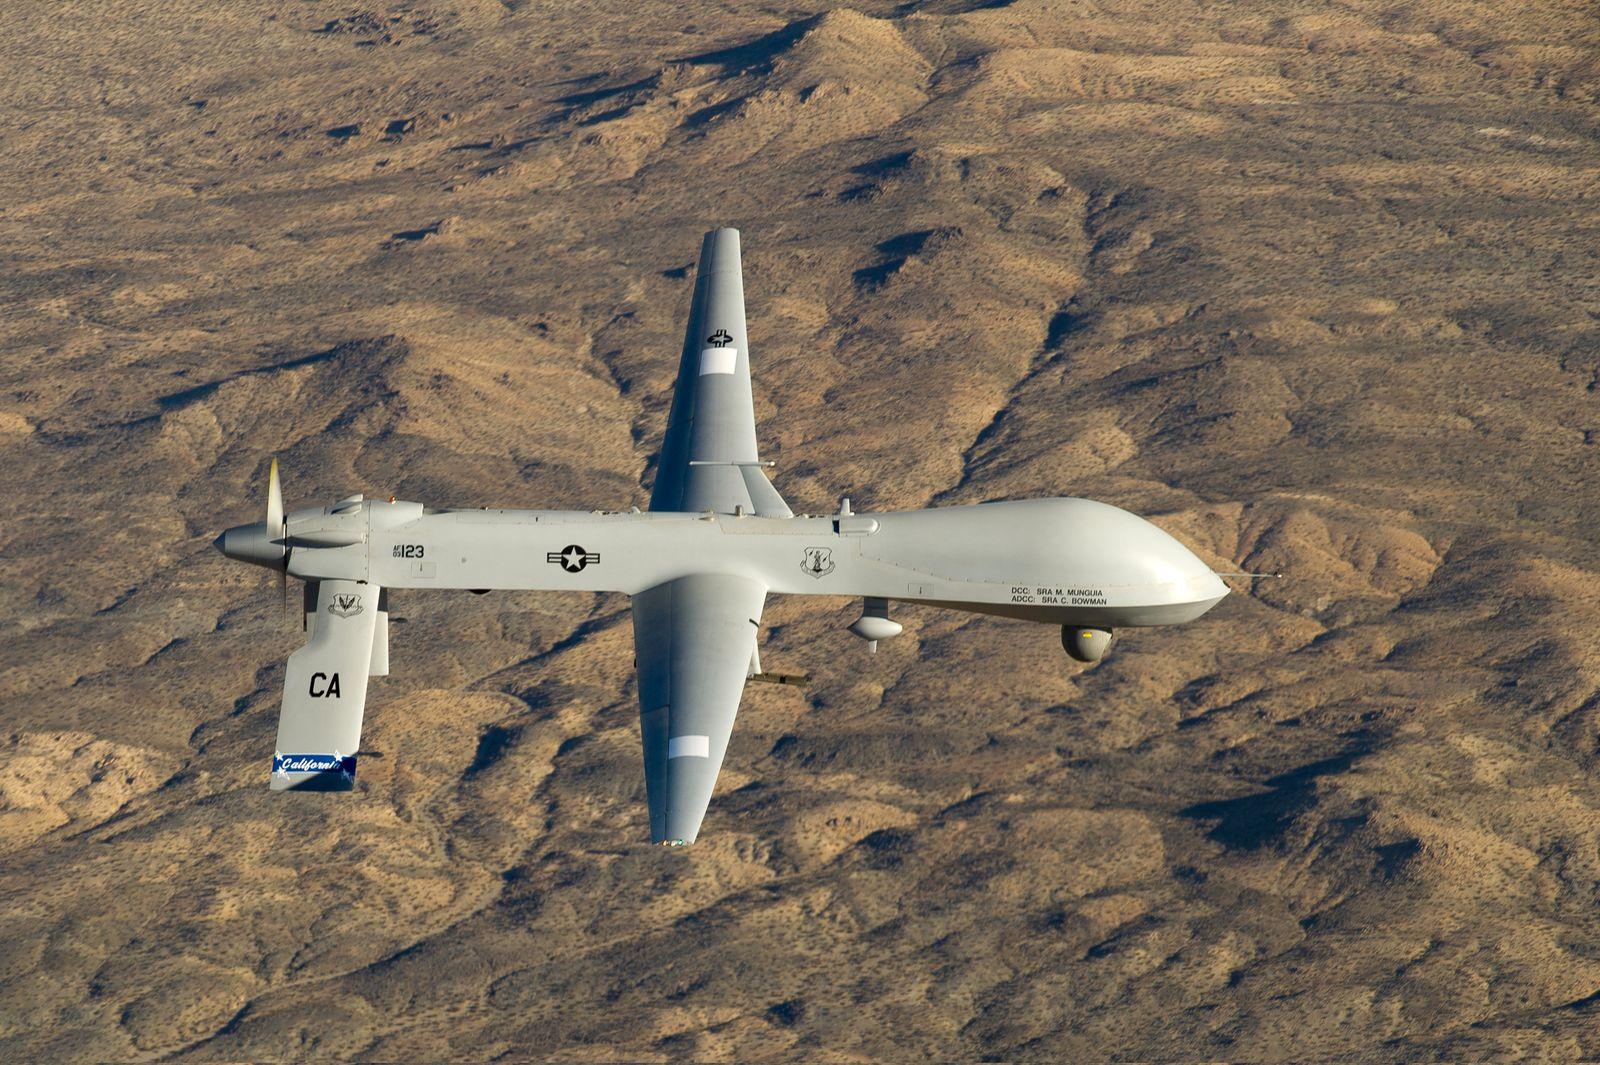 US-Drohne Typ MQ-1 Predator/ Afghanistan